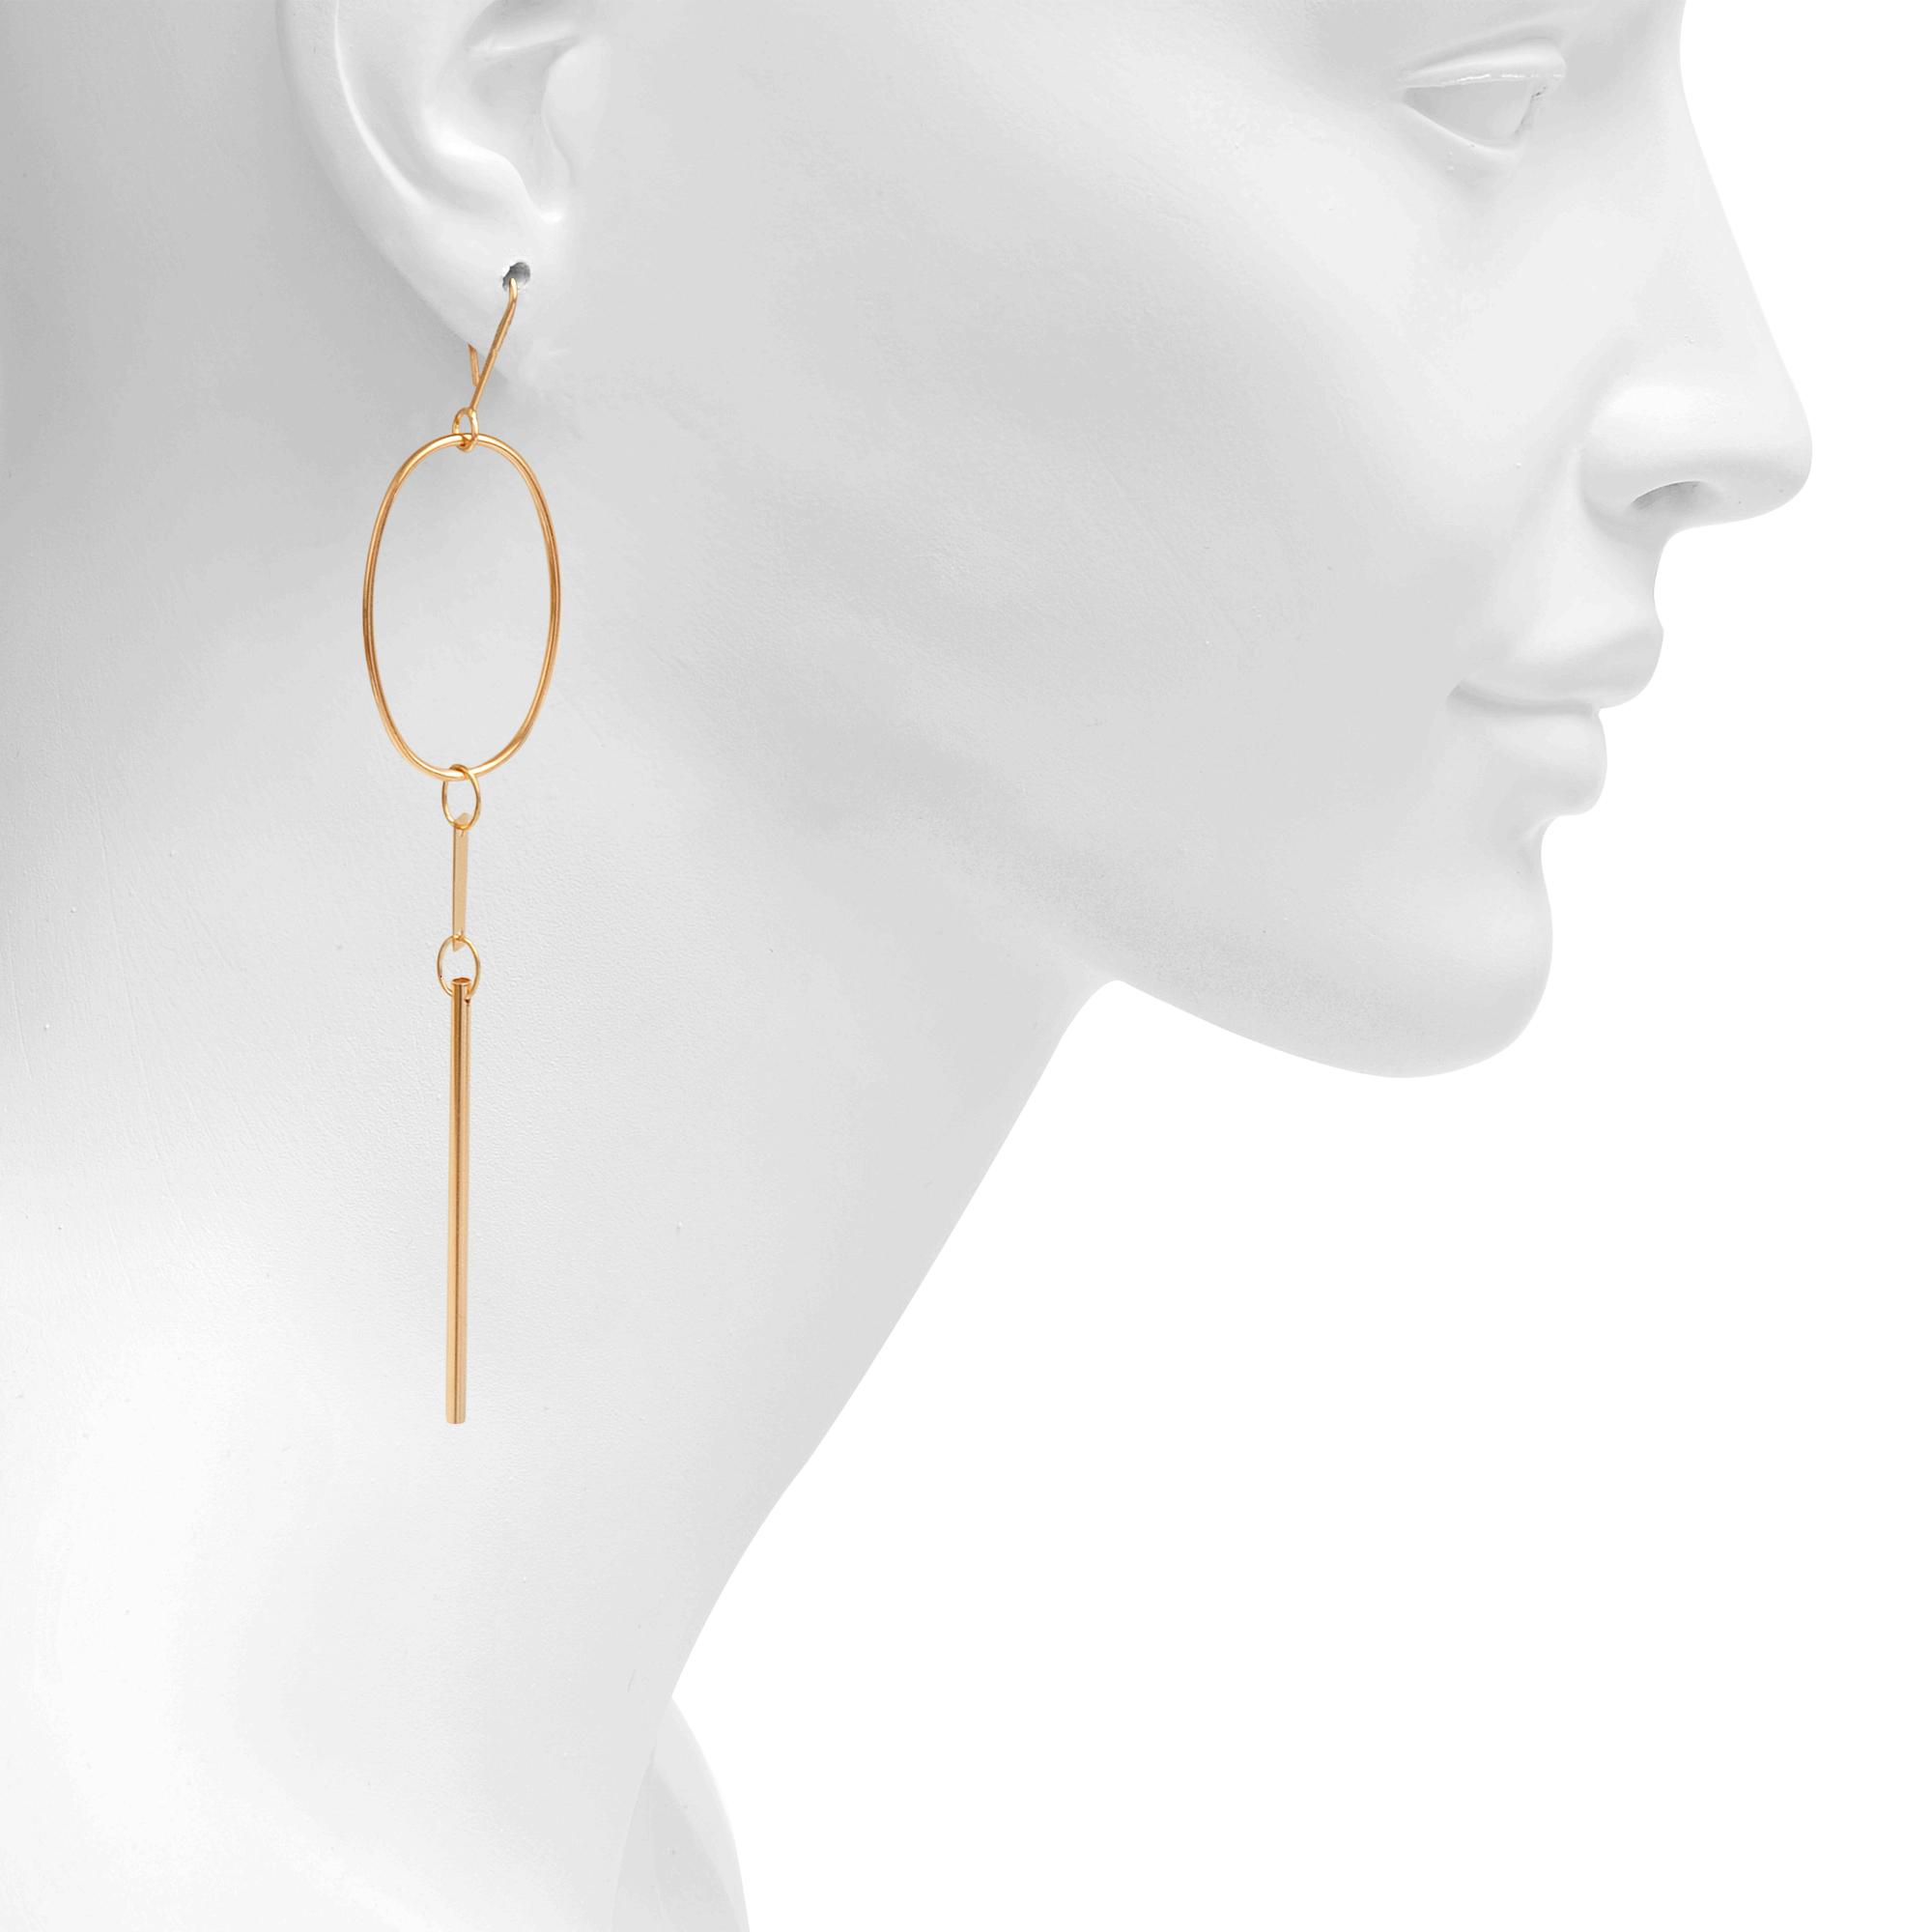 Vanrycke Exclusive - Mono earring Im In Love 750 gold and diamonds C2ehmOYWG8